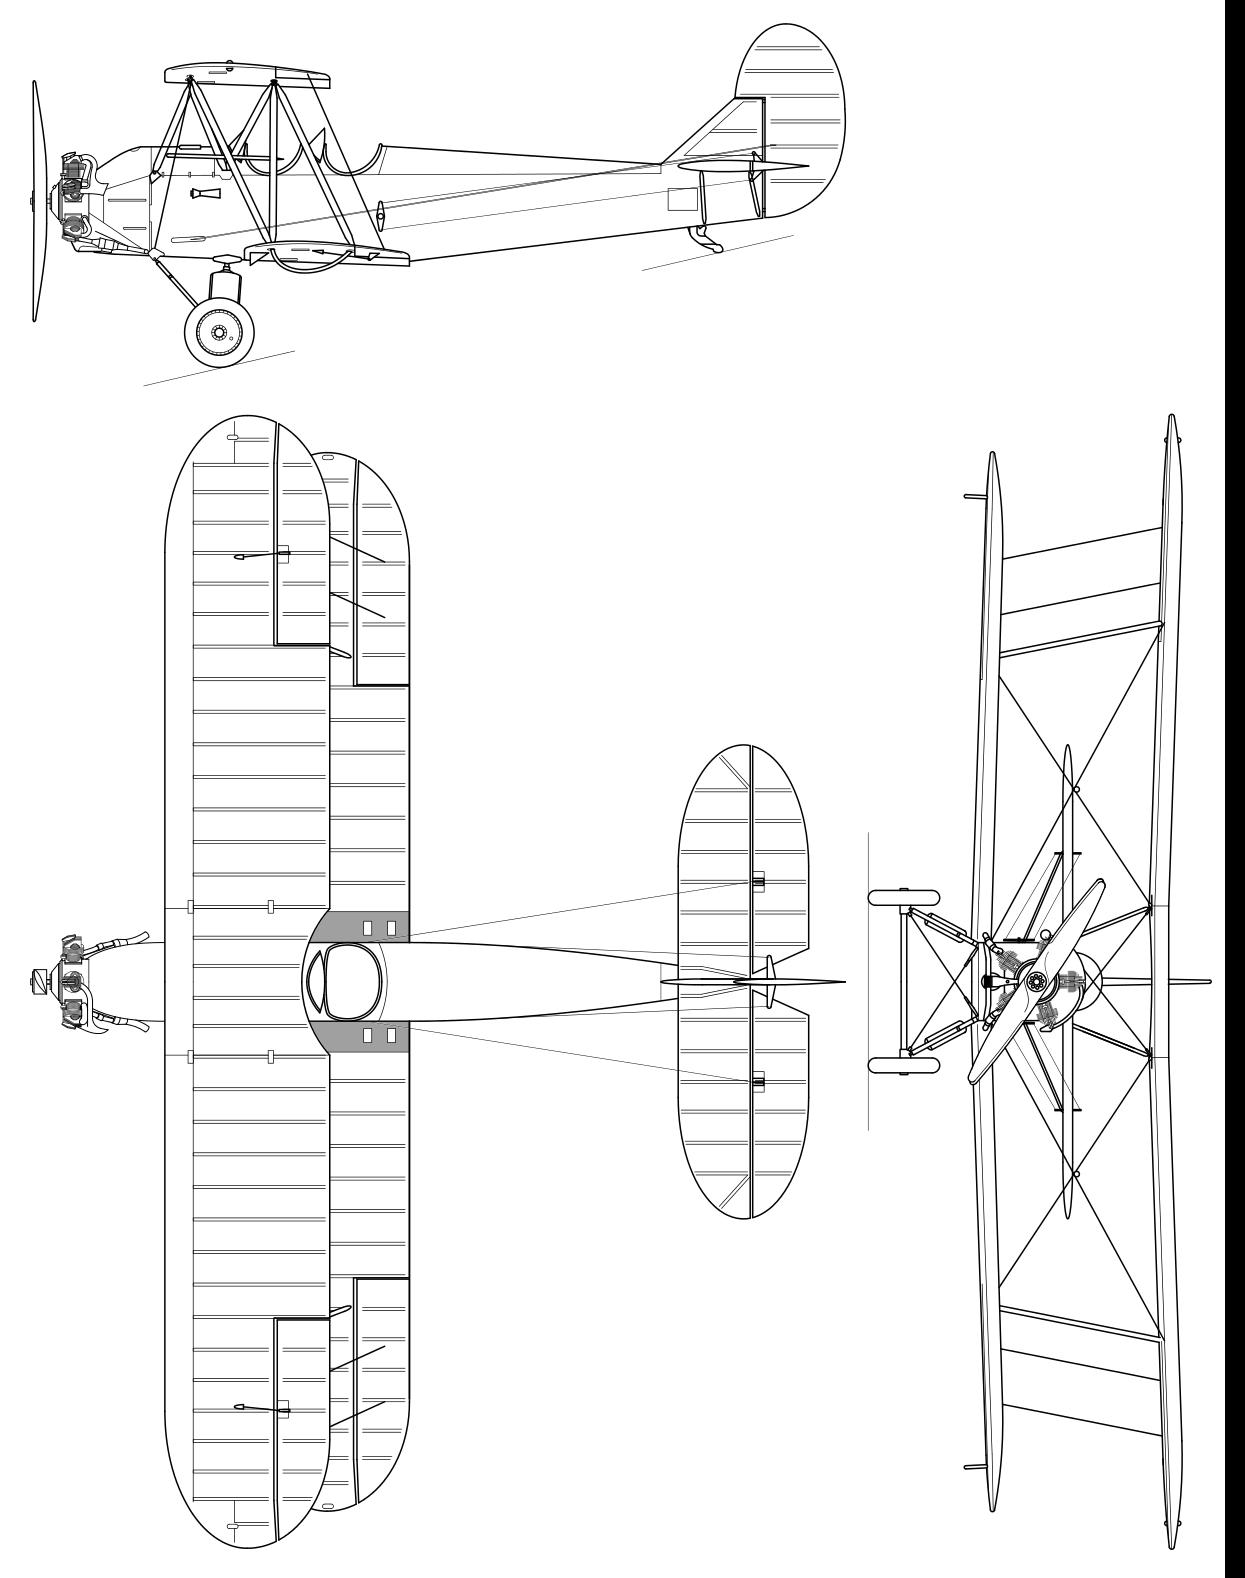 U2-2 blueprint